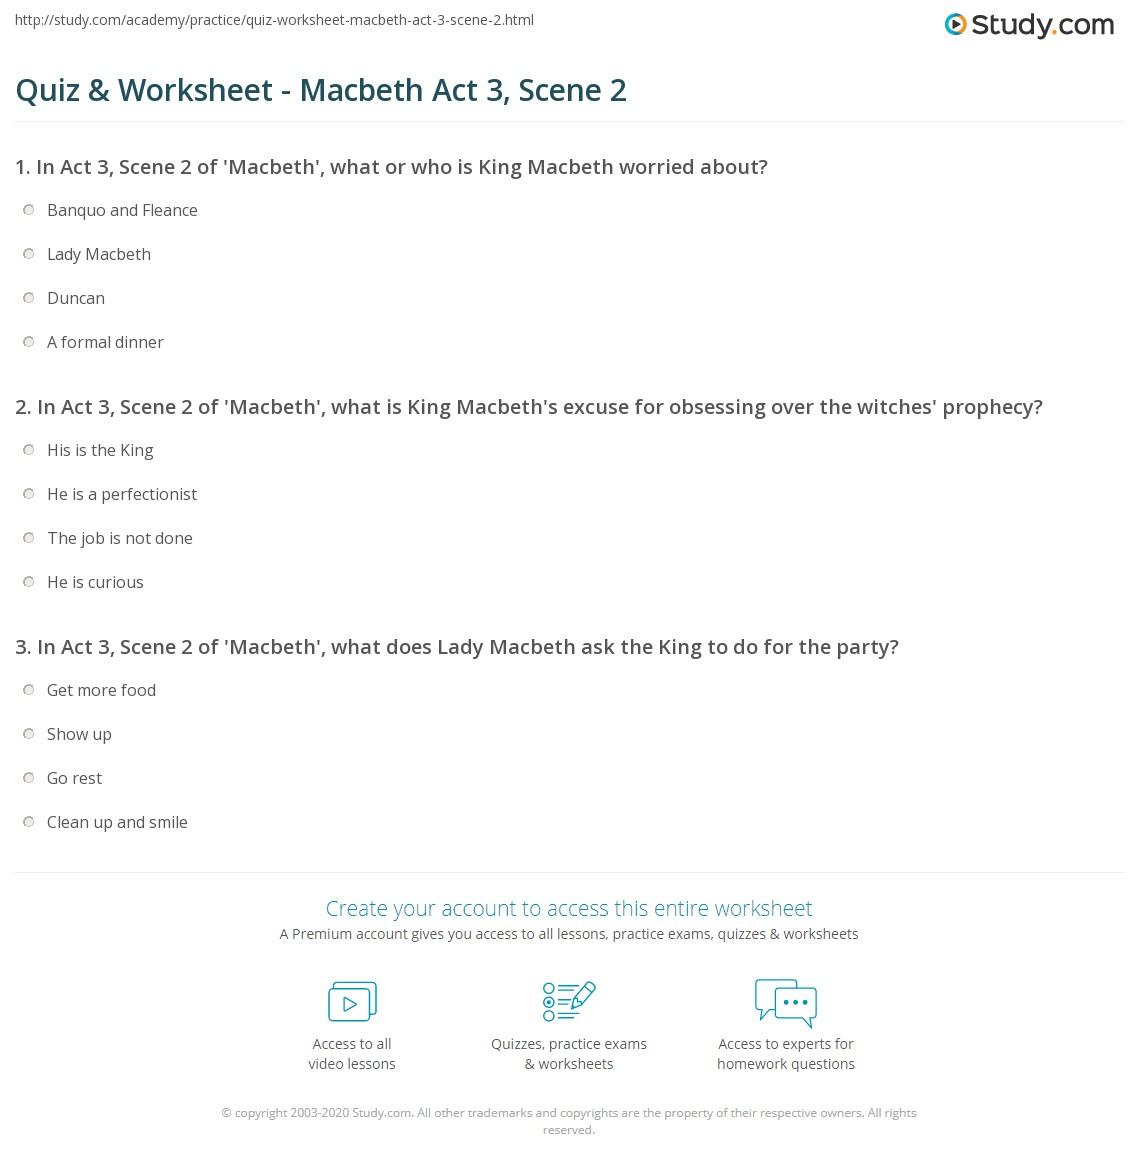 Print Macbeth Act 3, Scene 2: Summary & Quotes Worksheet